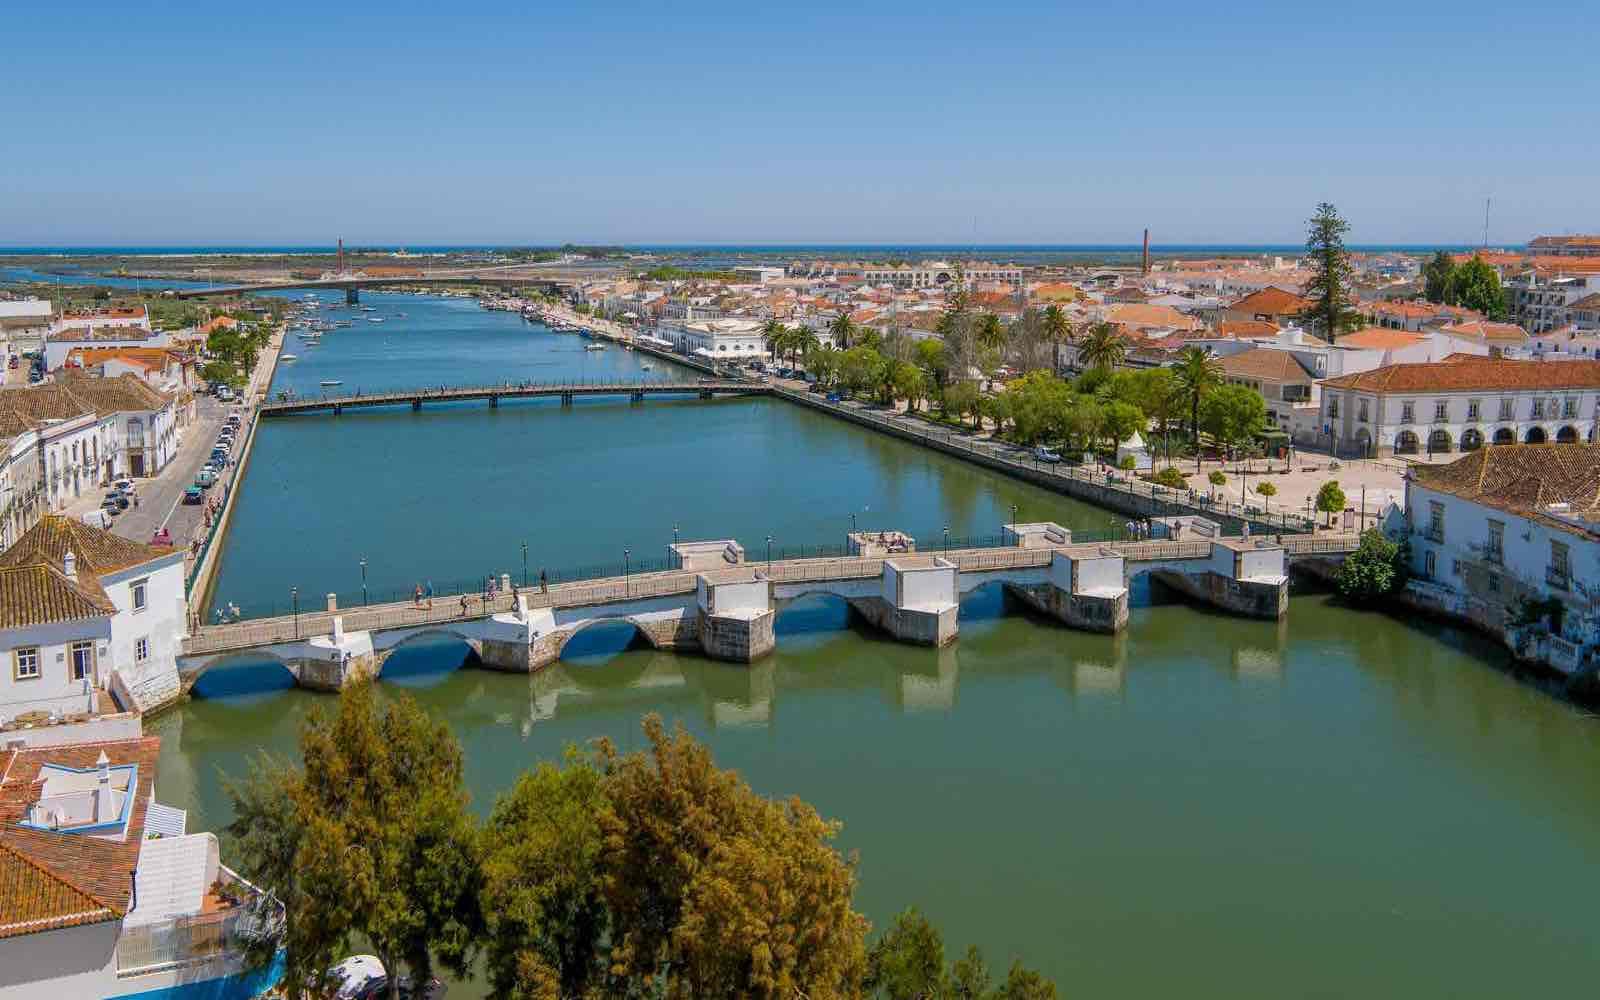 Tavira town by the sea, Algarve, Portugal